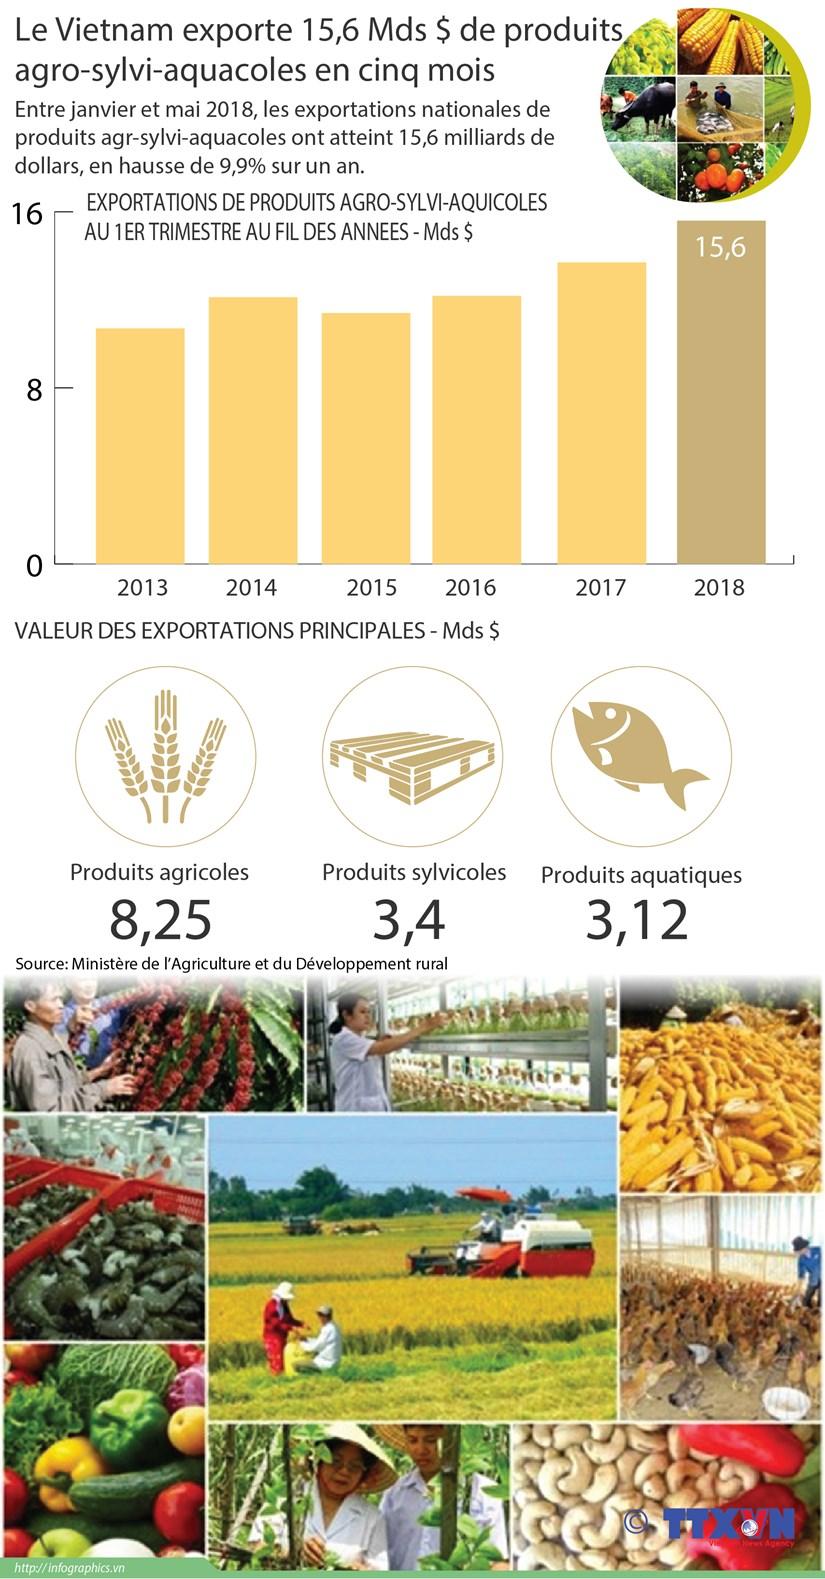 Le Vietnam exporte 15,6 Mds $ de produits agro-sylvi-aquacoles en cinq mois hinh anh 1